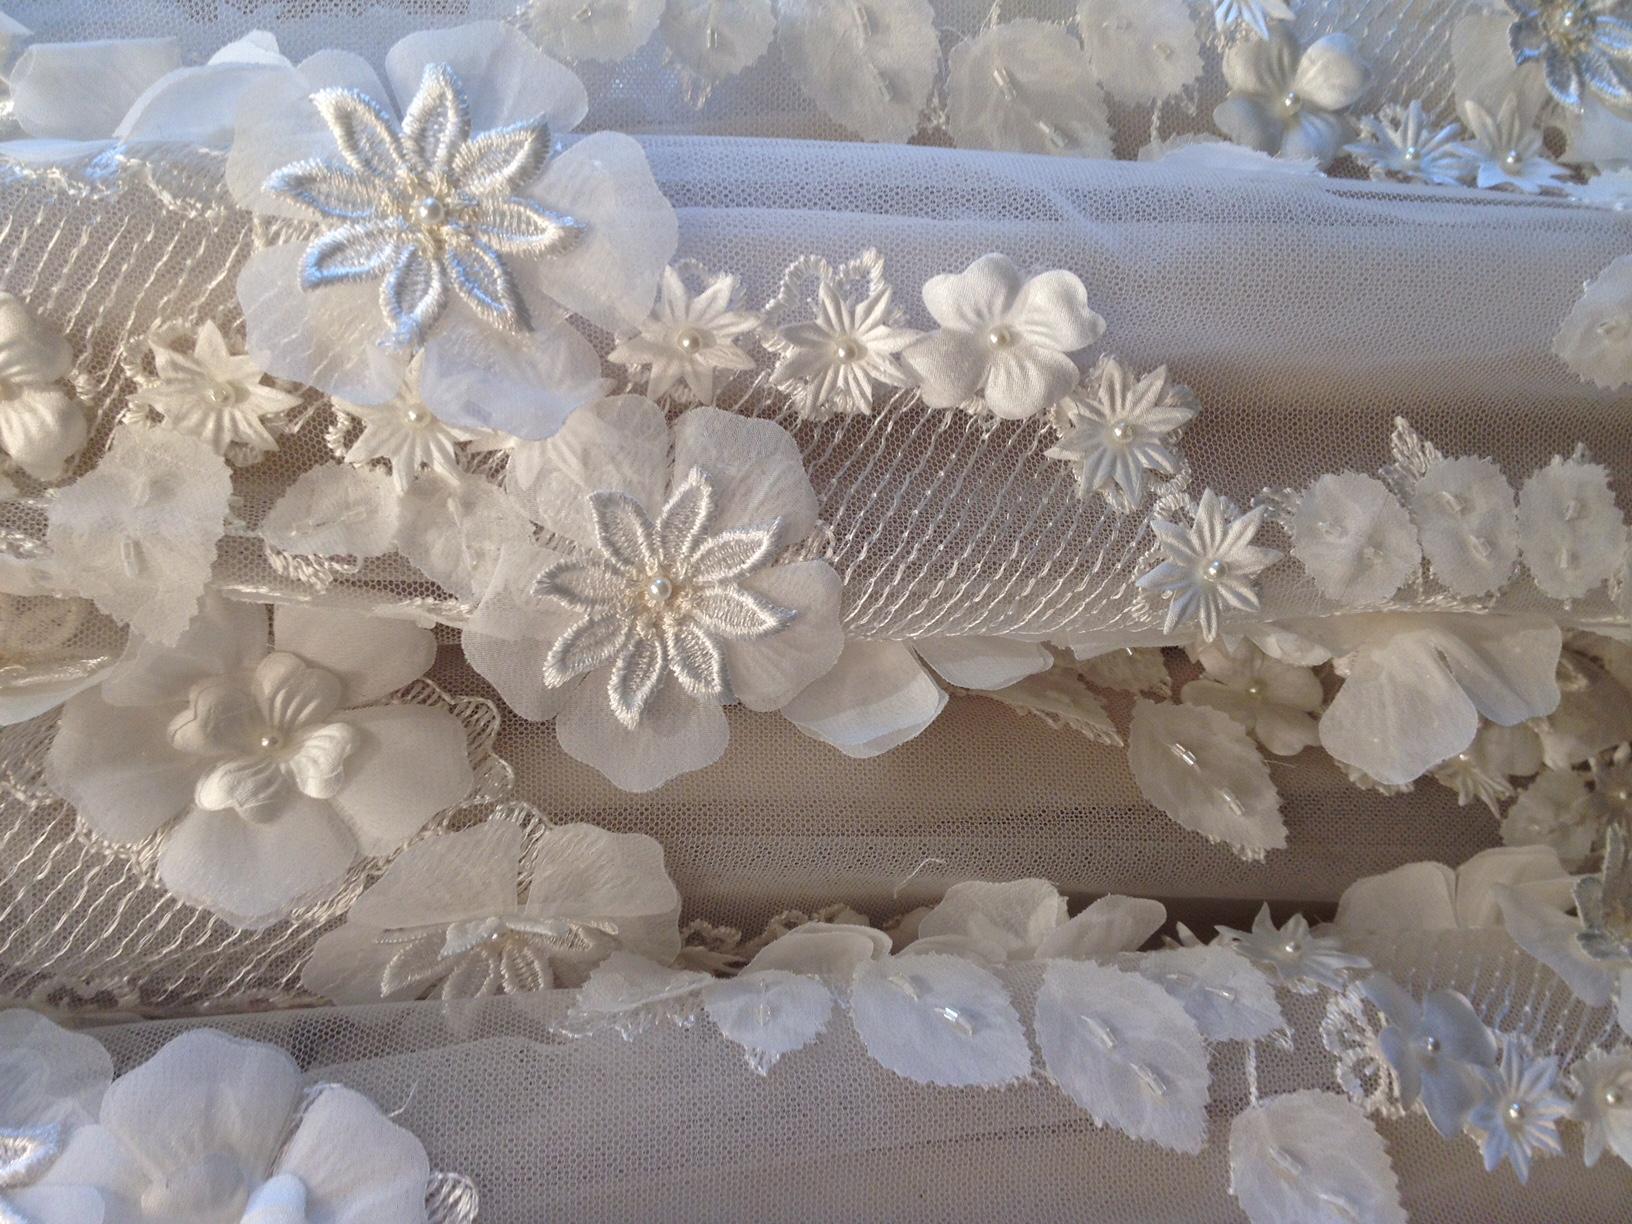 IMG_1527Christening Outfits by Nelder Jones